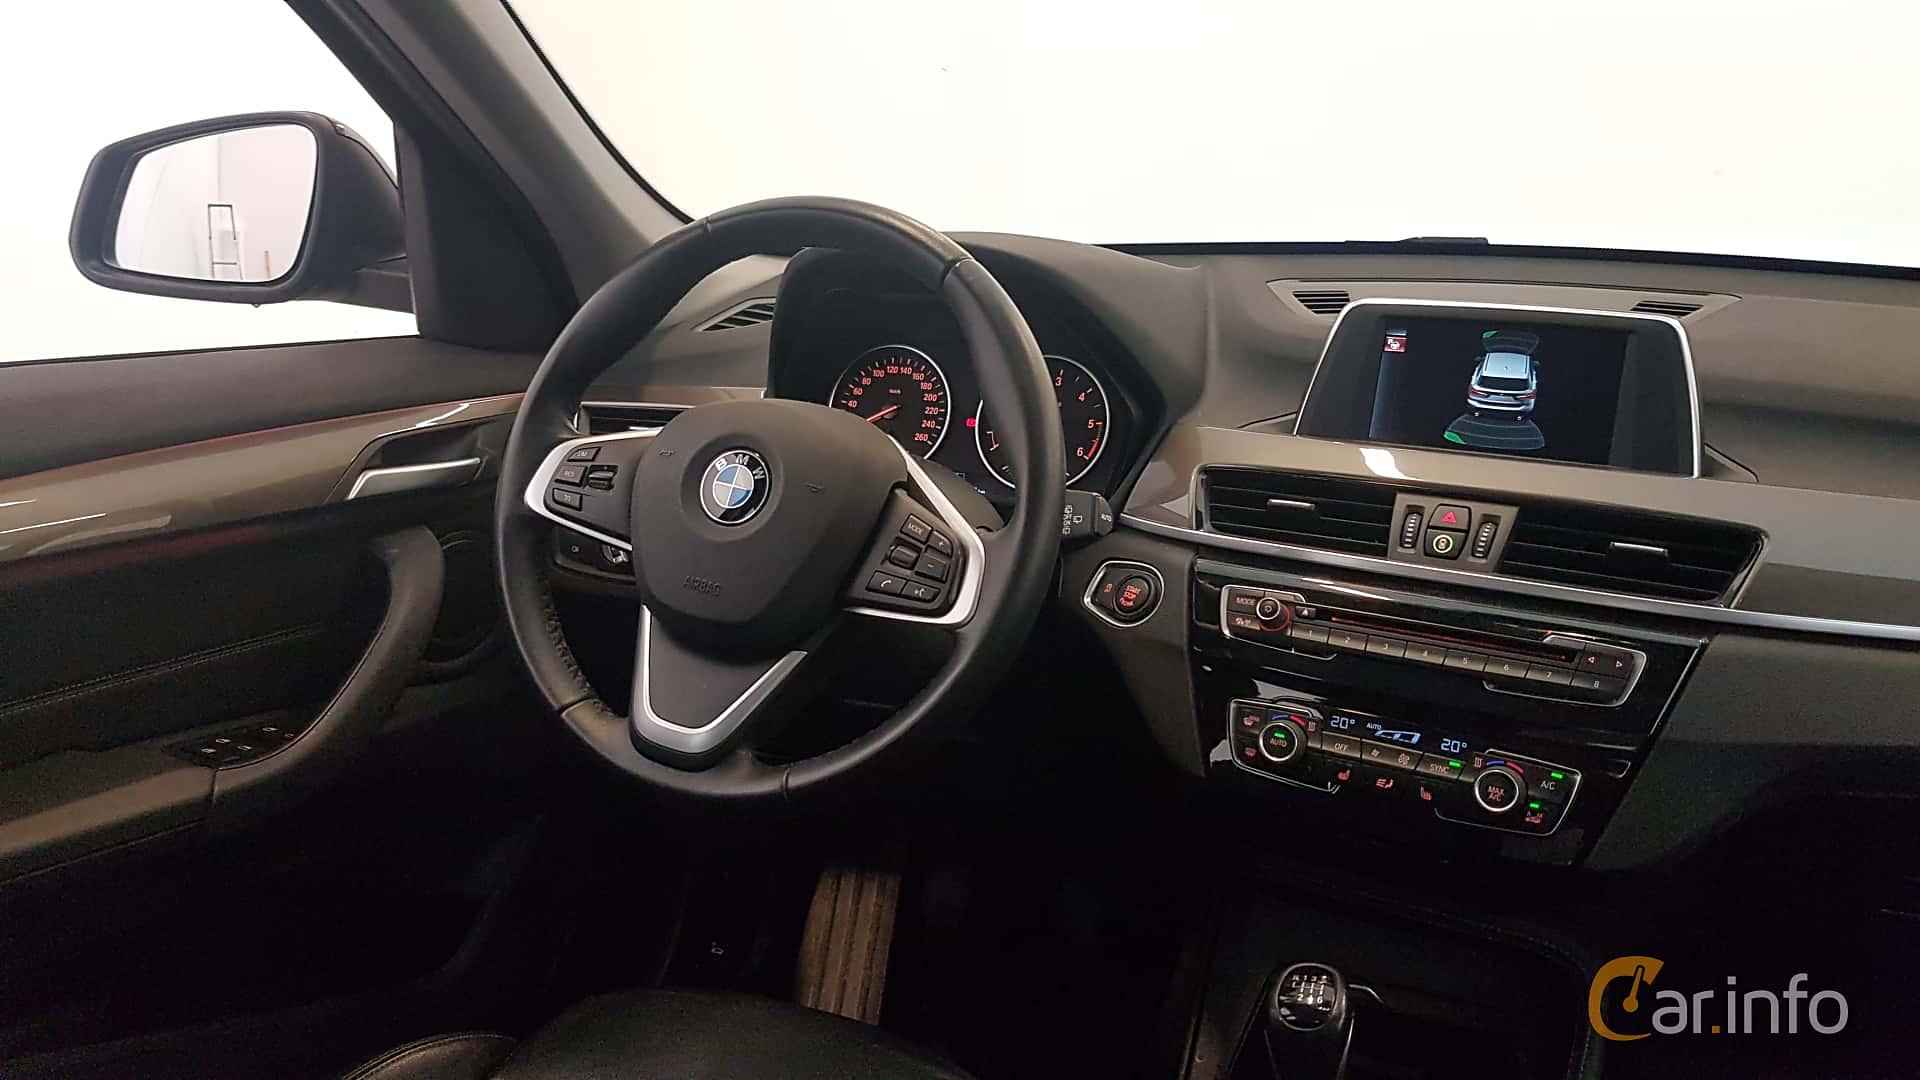 BMW X1 xDrive18d  Manual, 150hp, 2016